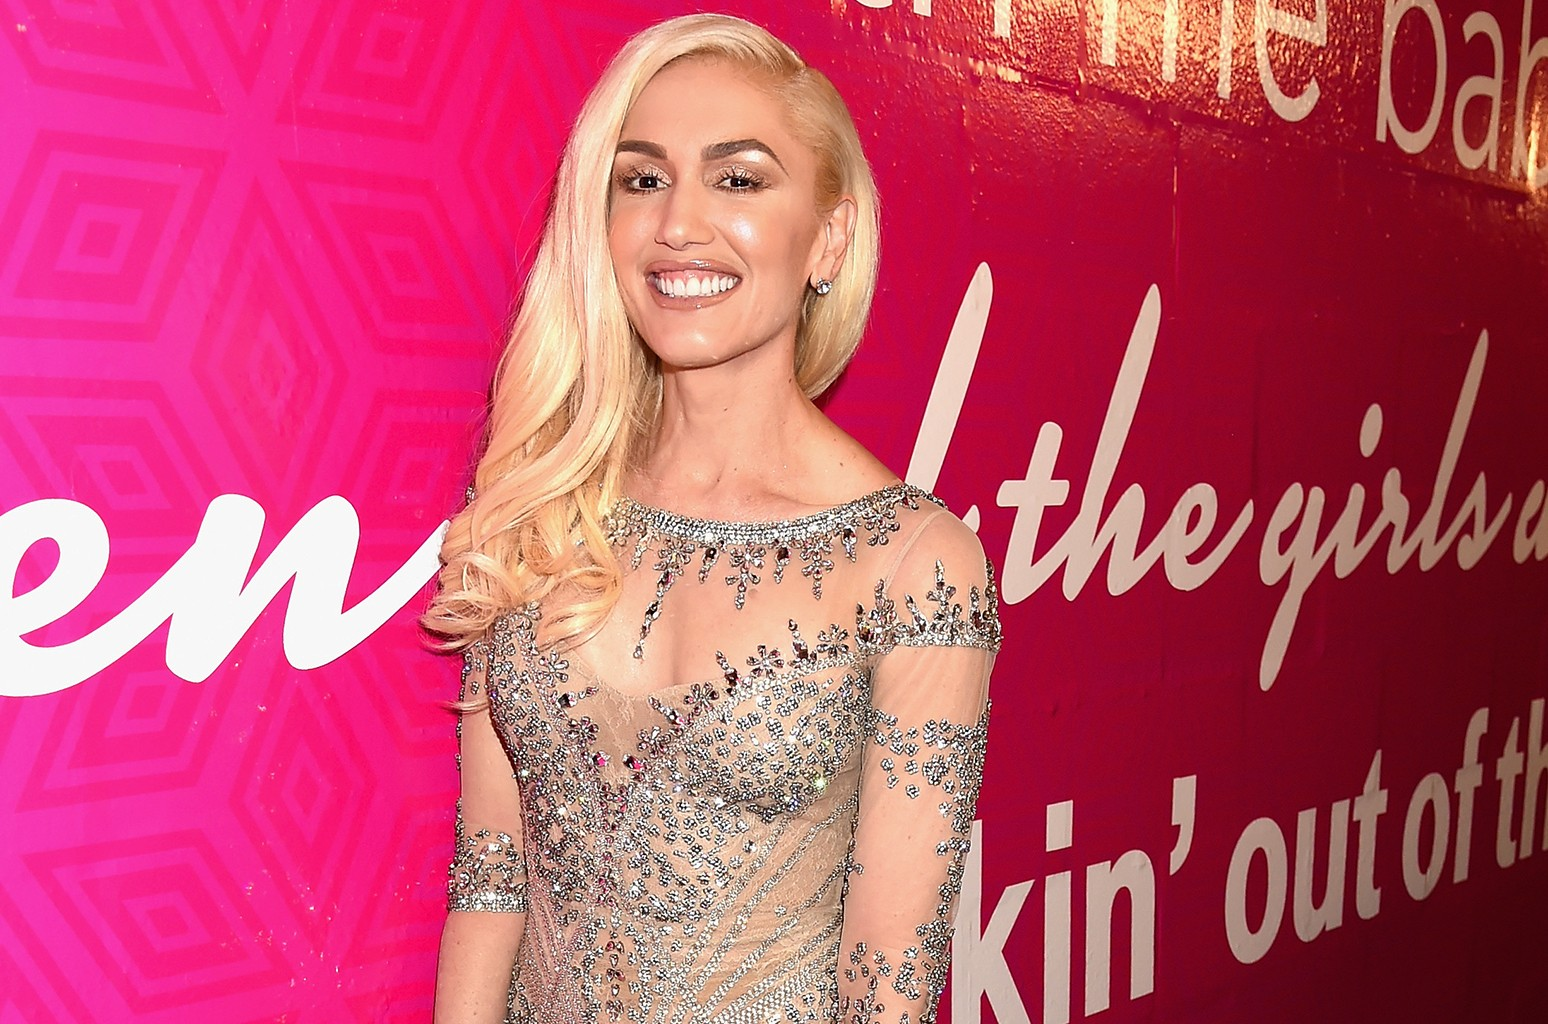 Gwen Stefani attends the 2016 Billboard Music Awards